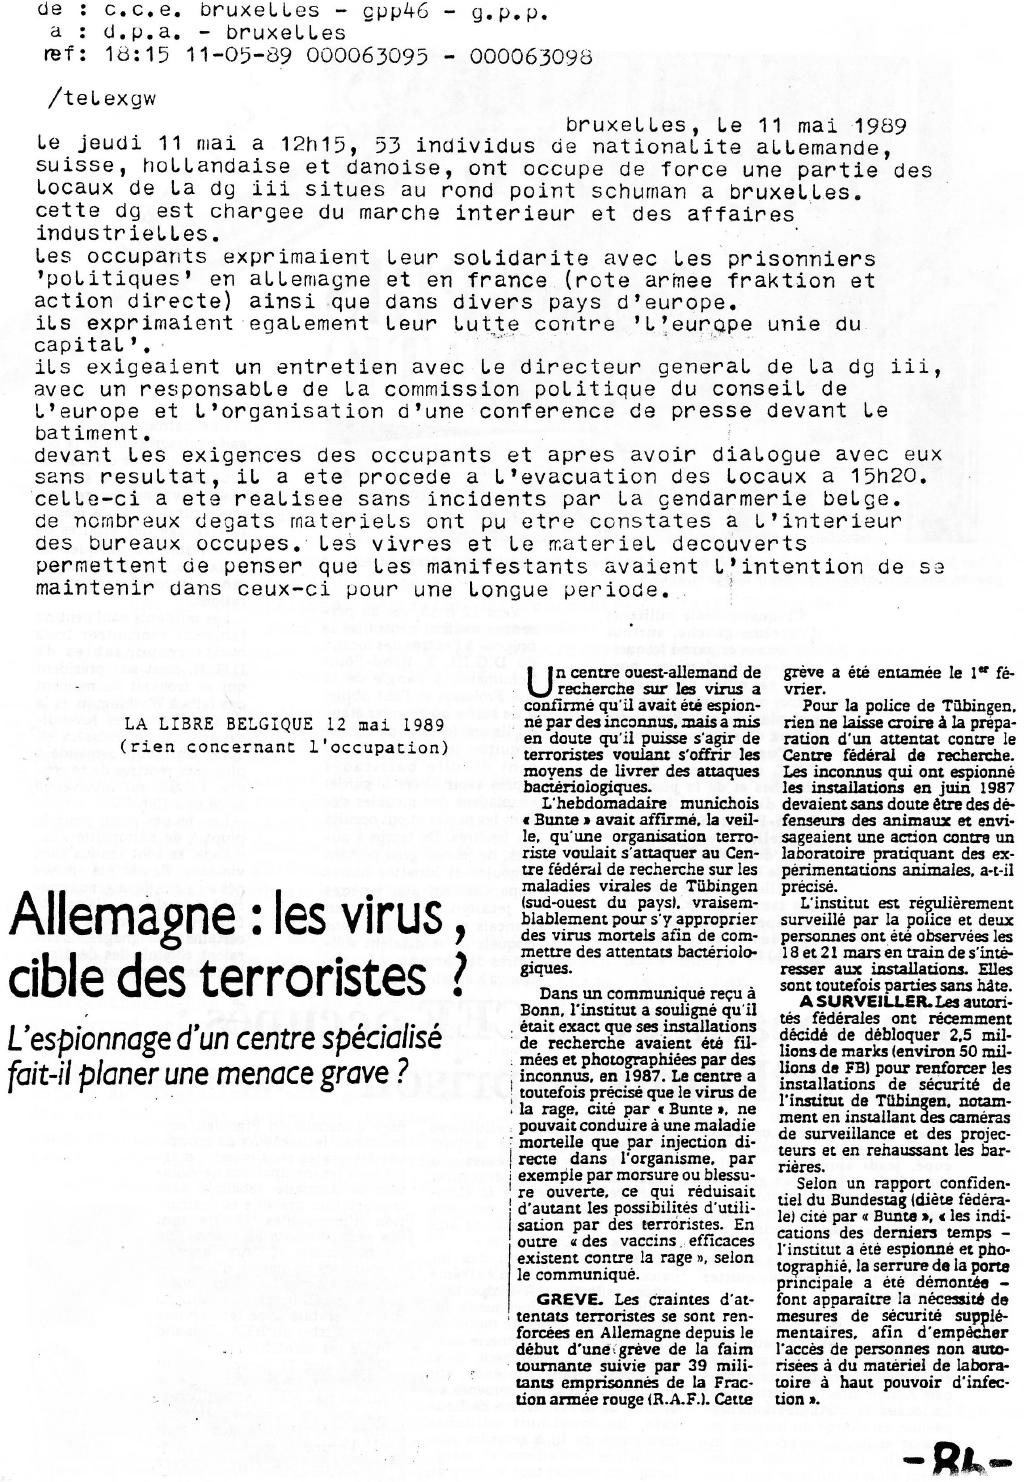 Belgien_Doku_Besetzung_EG_Kommission_1989_088